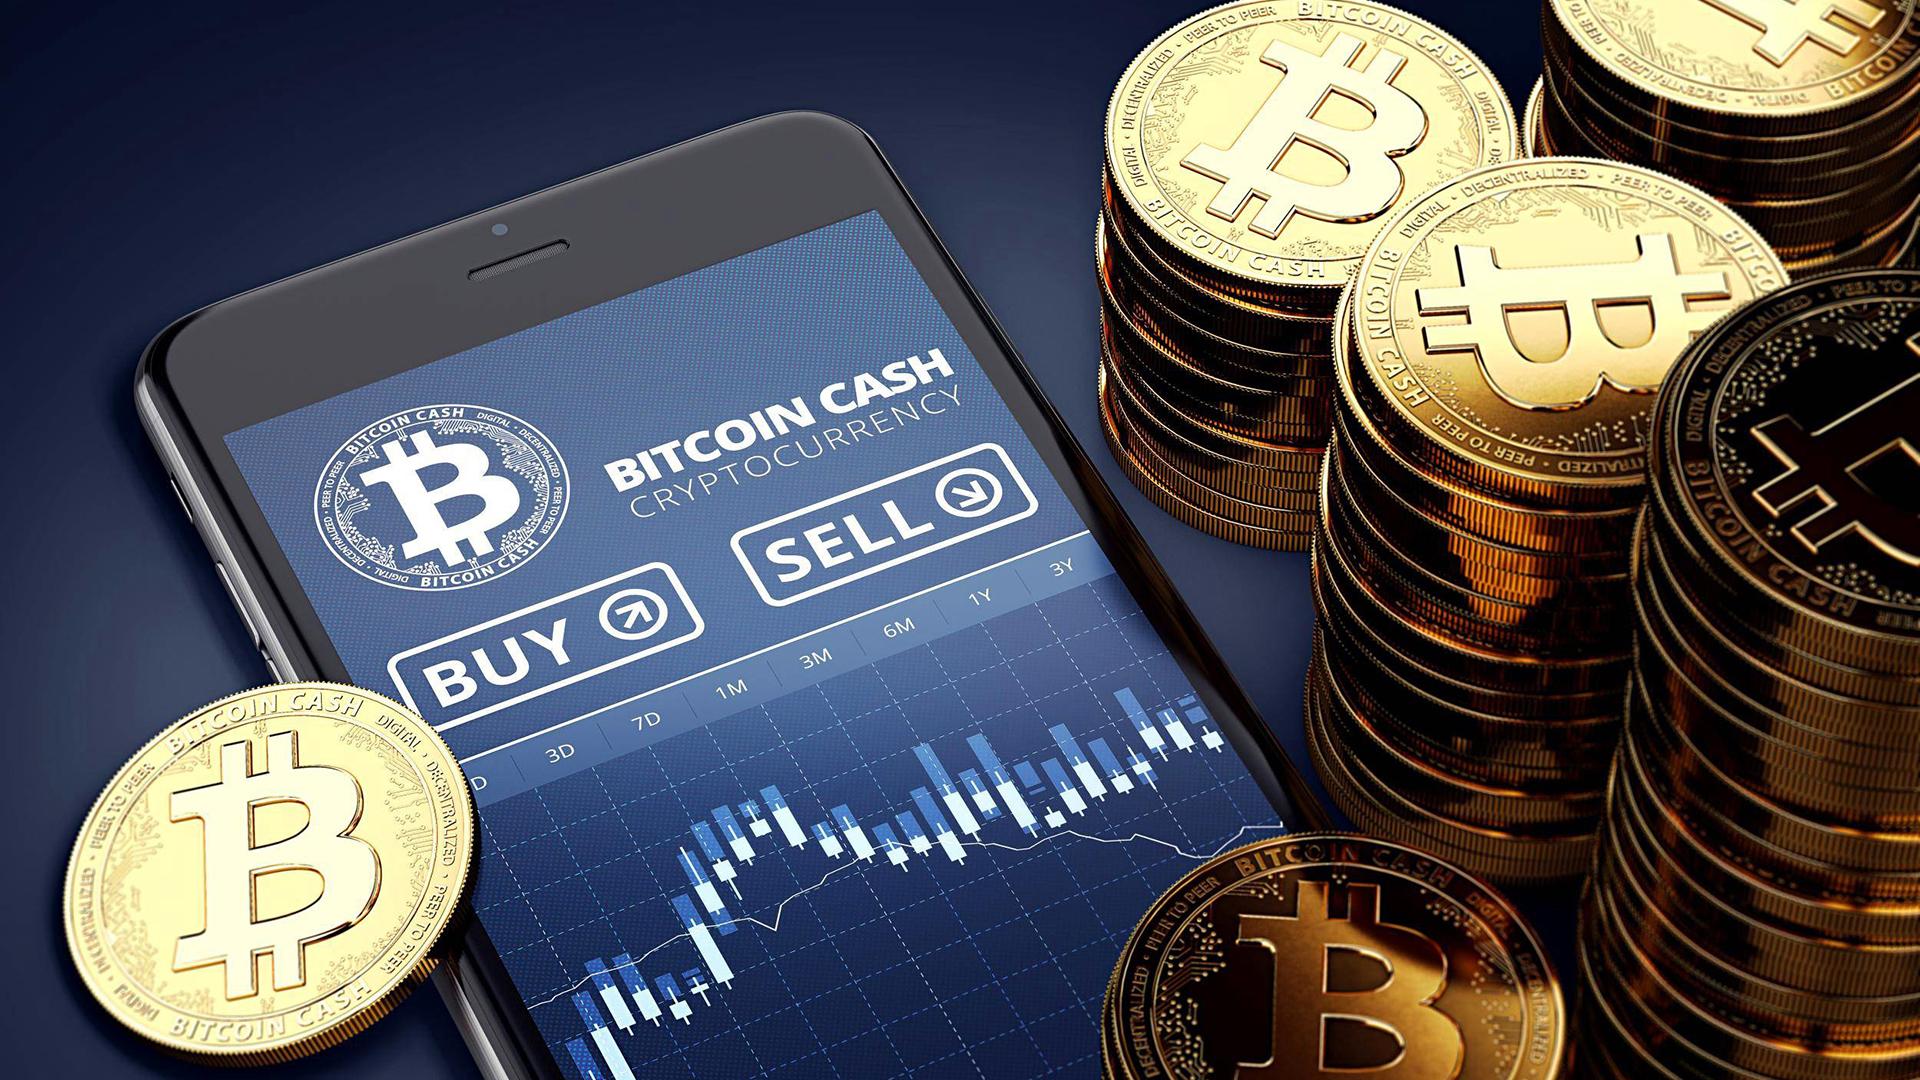 Decrypt Bitcoin Cash Price Up 15% Since Hard Fork